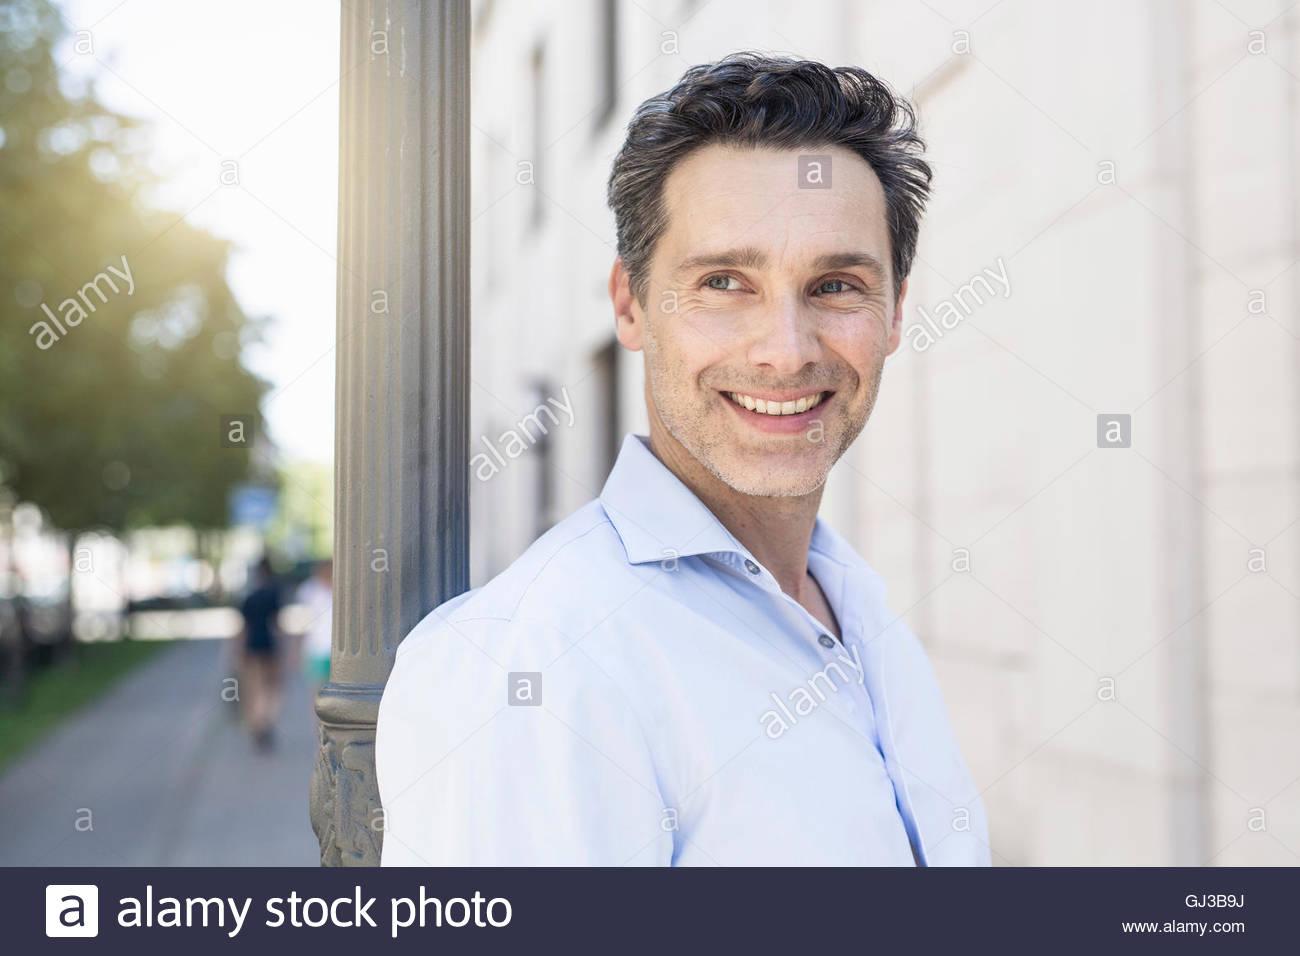 Mum looked at my masturbate